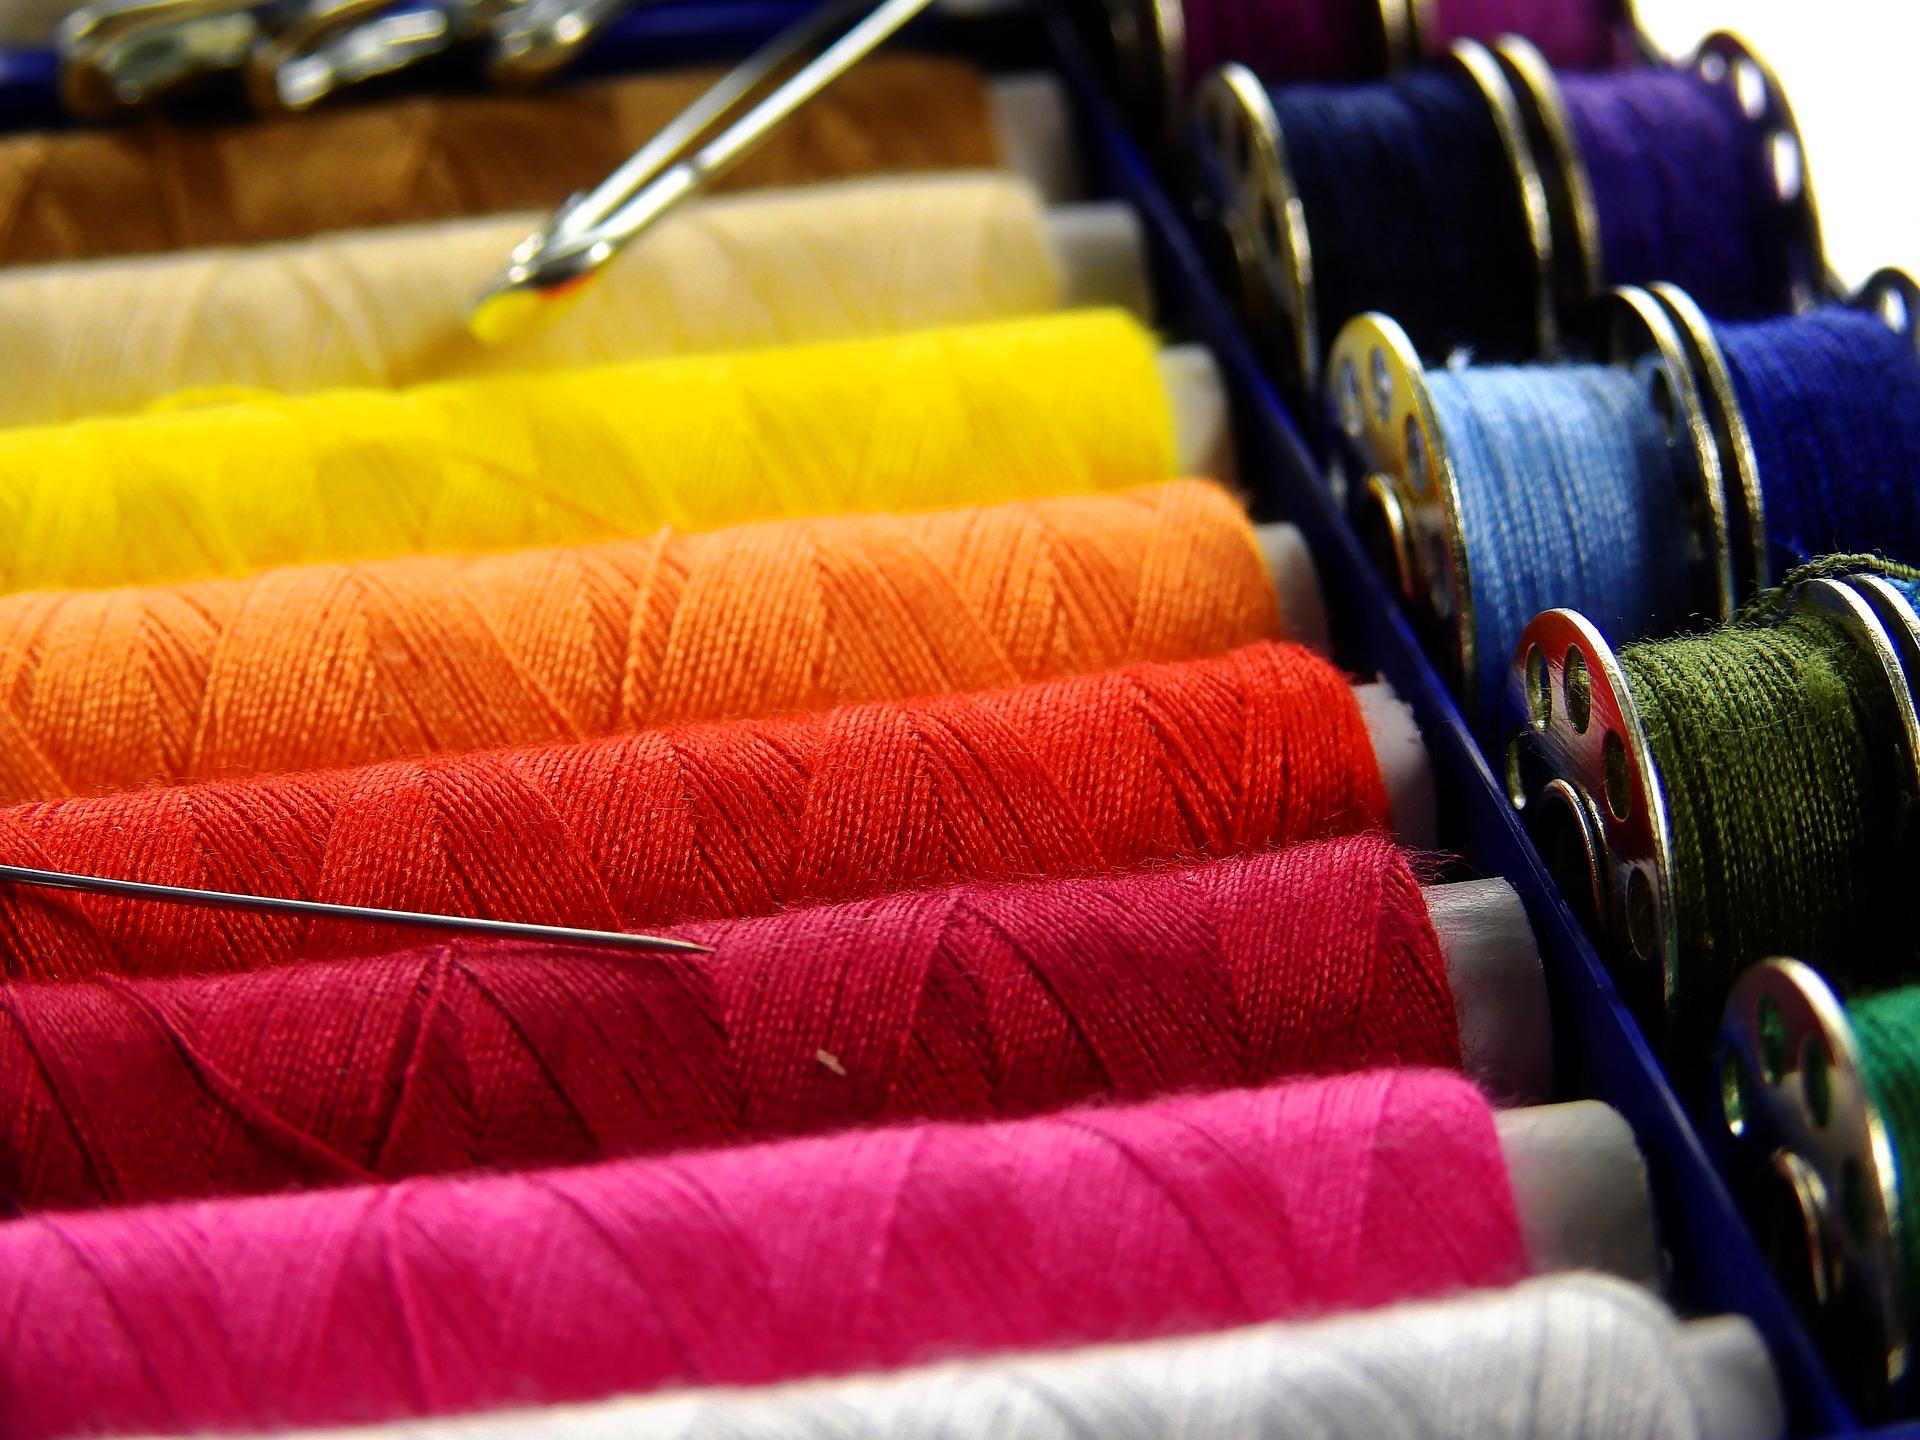 fibres and yarns